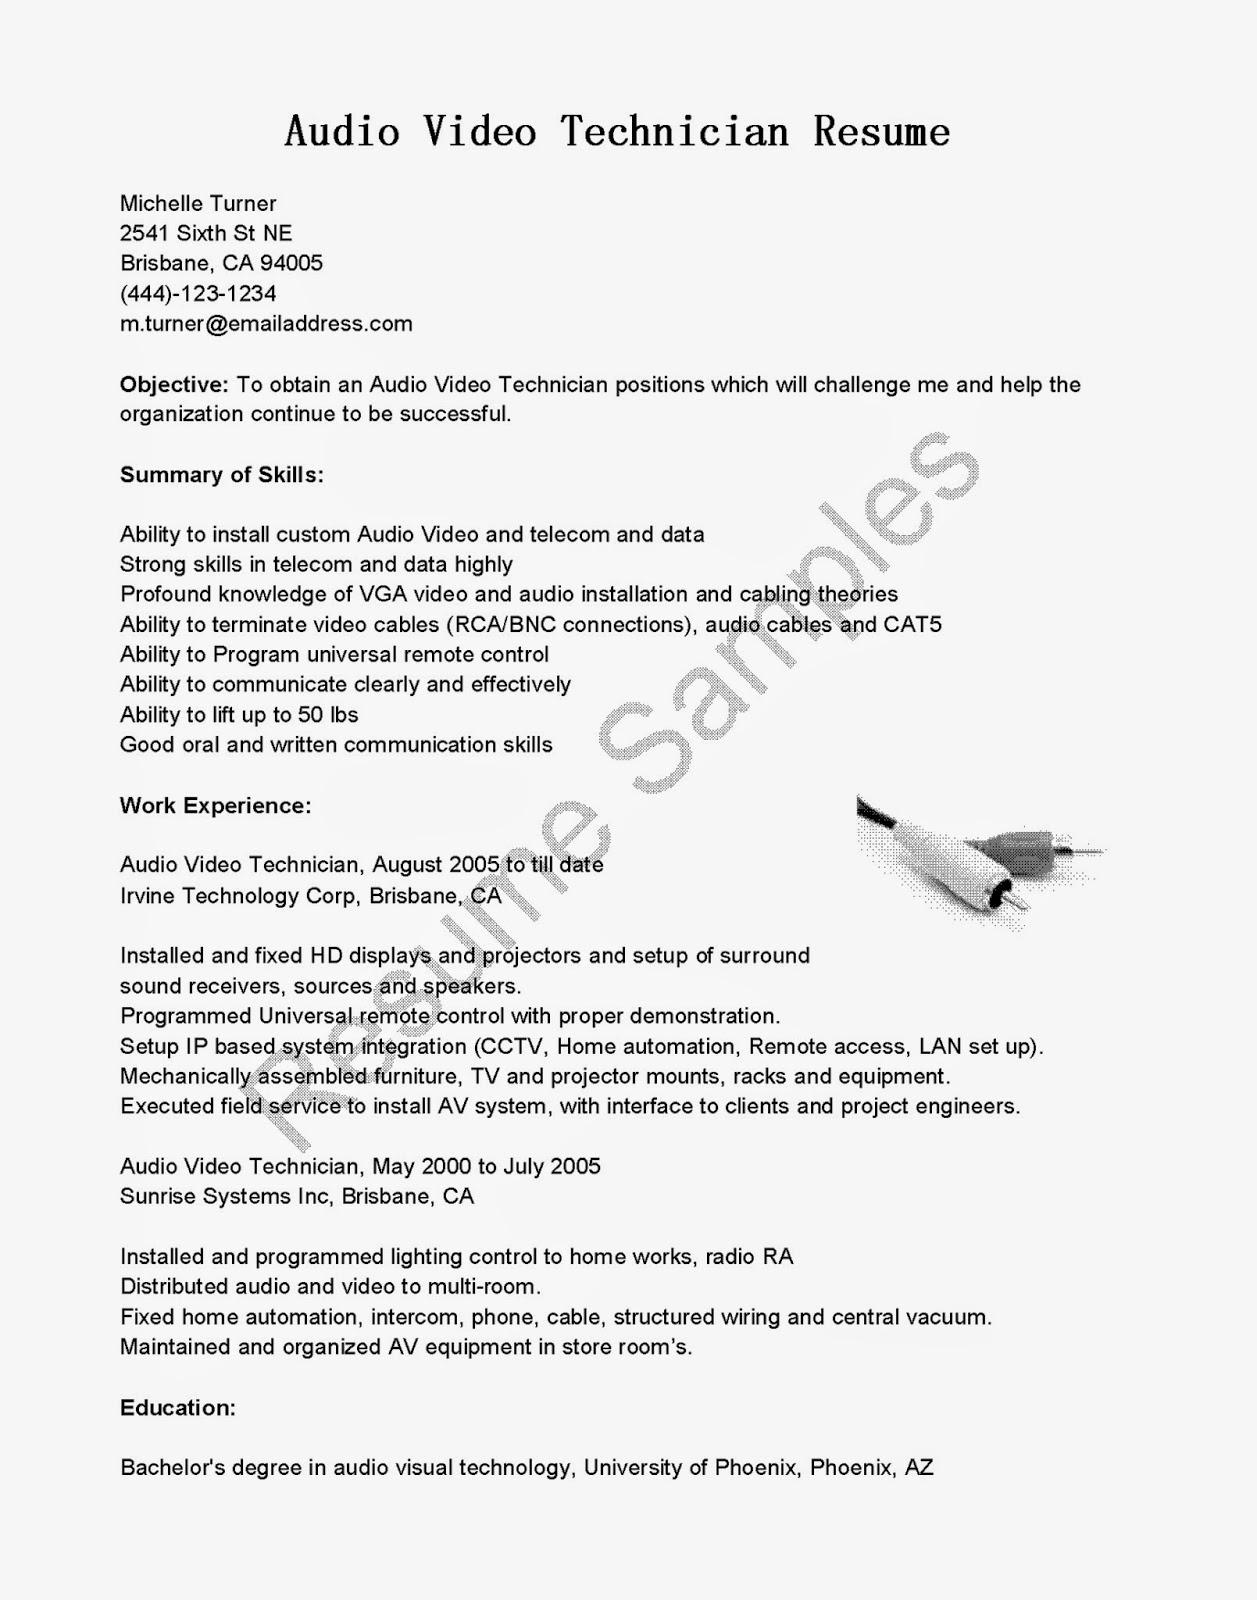 sound engineer resume - Etame.mibawa.co